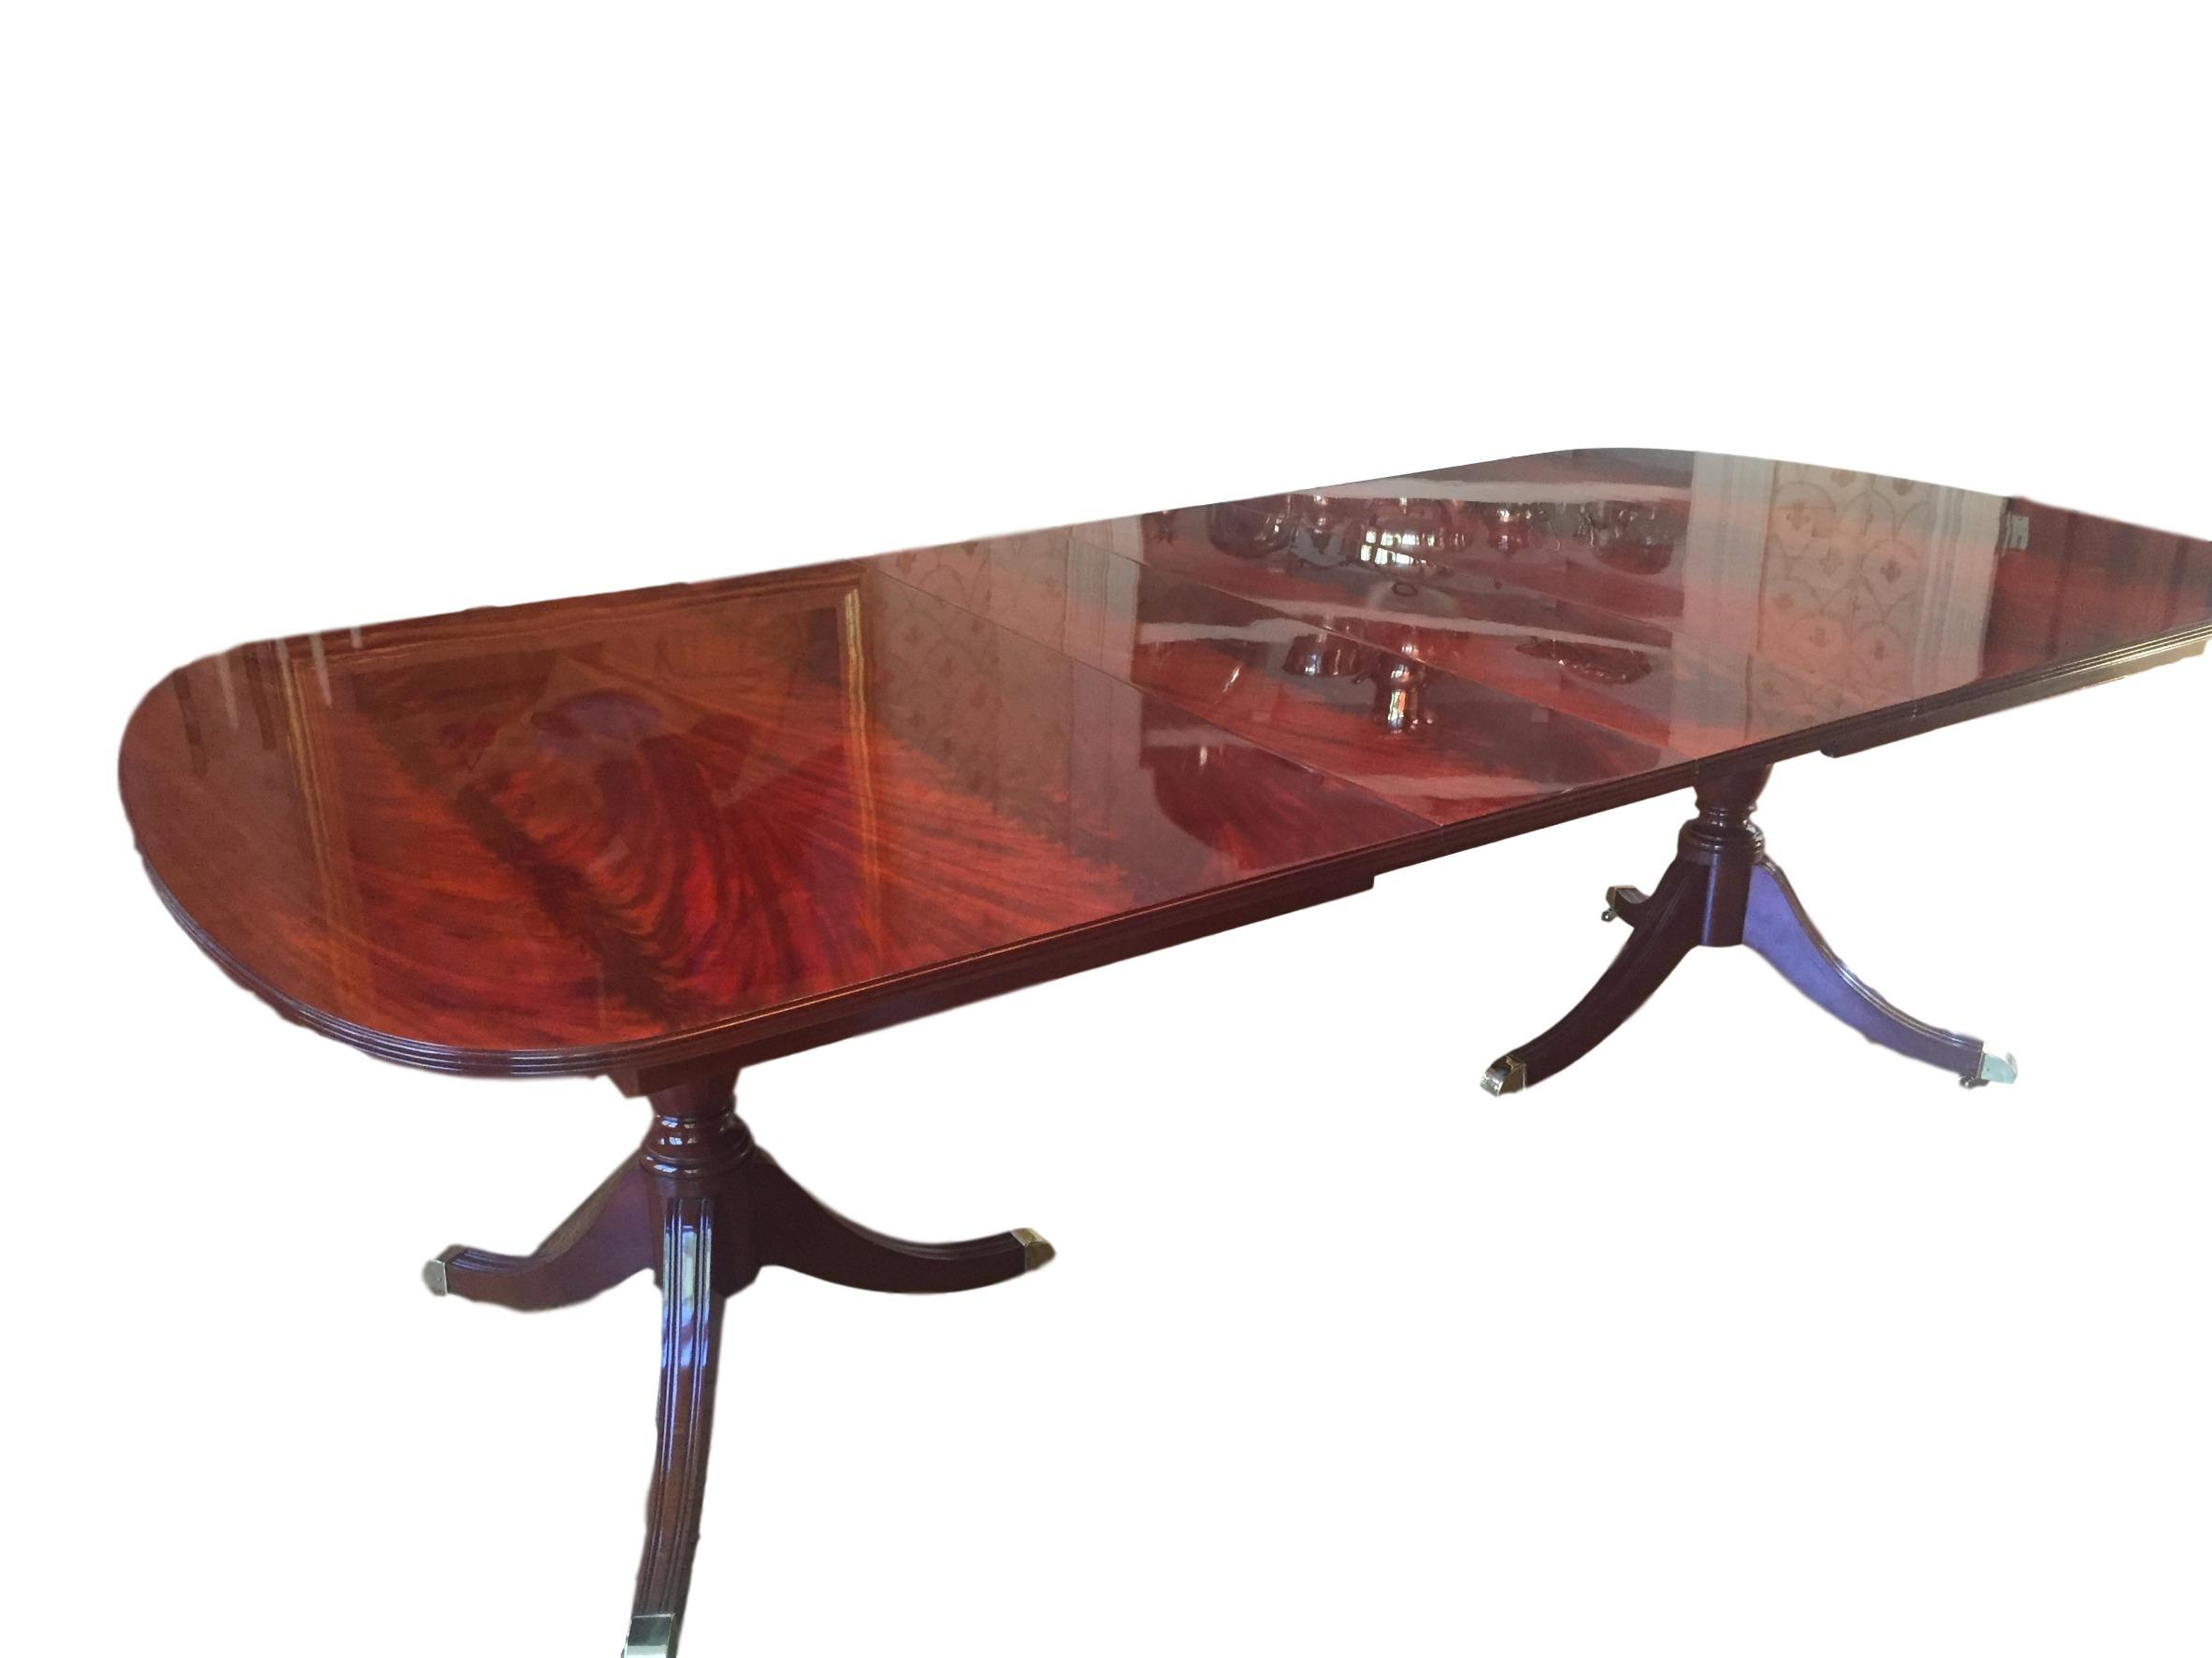 Kindel Crotch Mahogany Pedestal Dining Table Chairish : cf3f1523 9fe4 478b b08e b05e8089b75baspectfitampwidth640ampheight640 from www.chairish.com size 640 x 640 jpeg 22kB